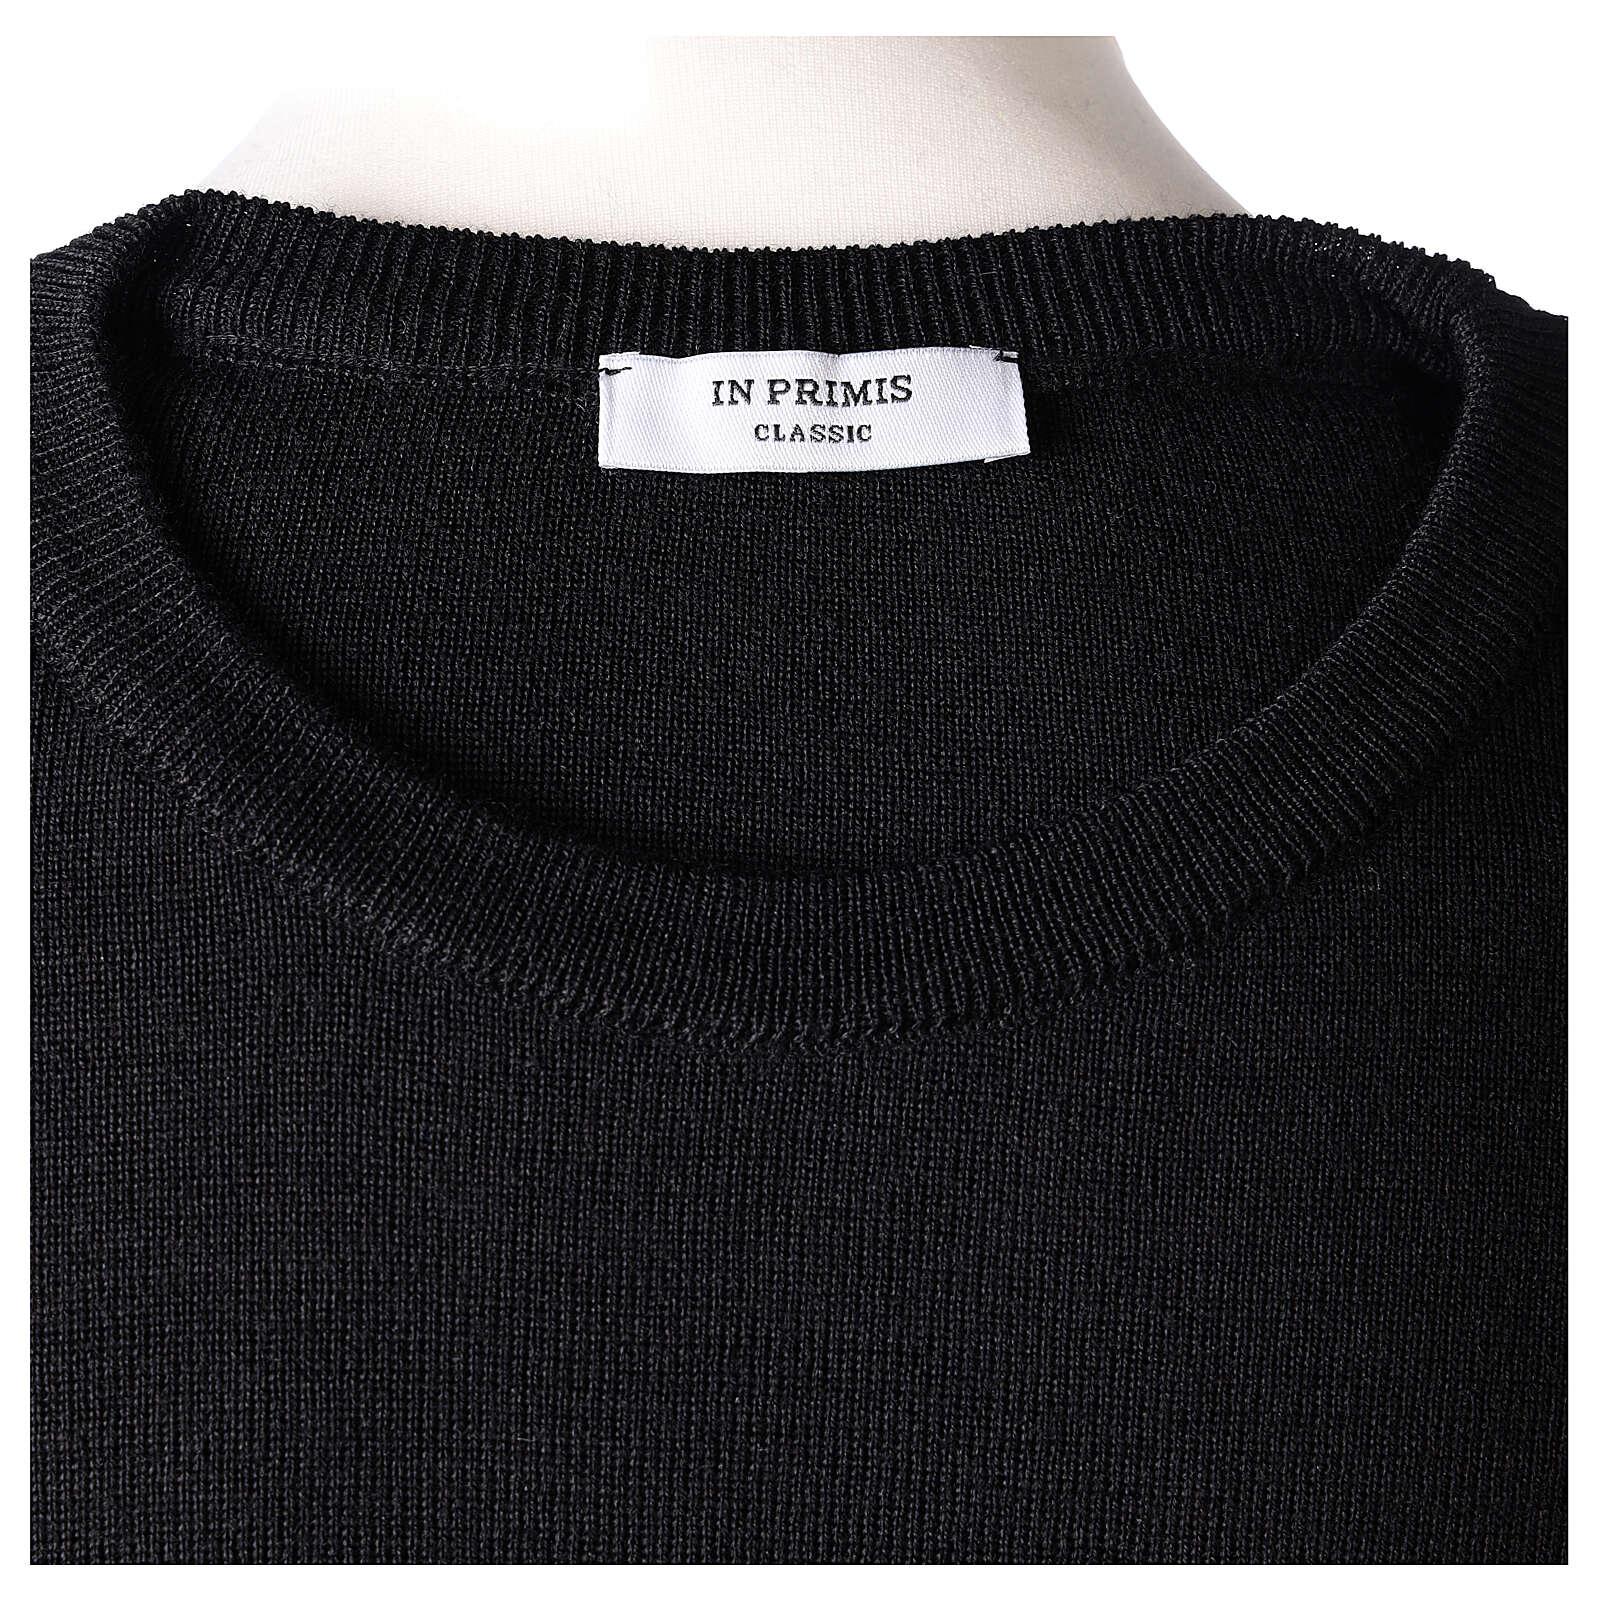 Crew neck clergy black jumper plain fabric 50% acrylic 50% merino wool In Primis 4